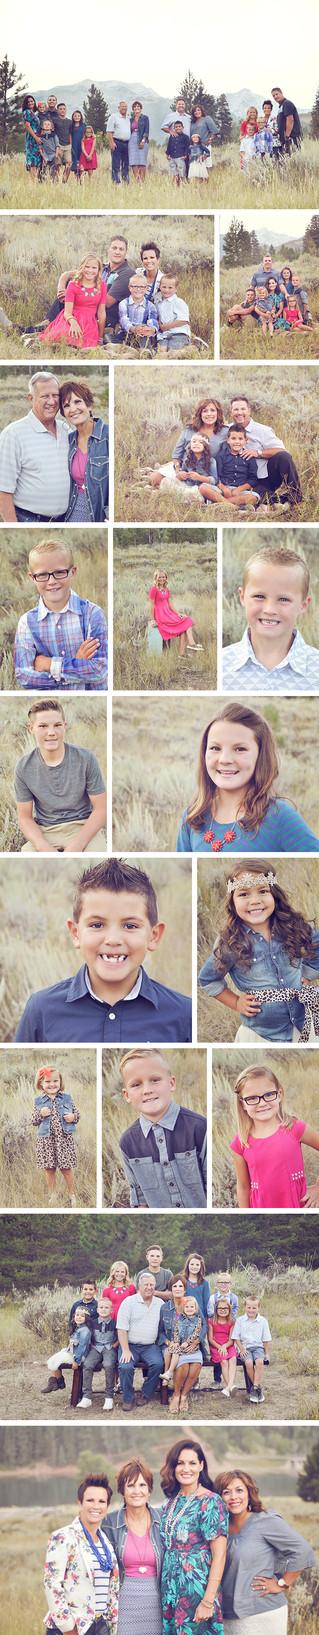 Dean Family 2015